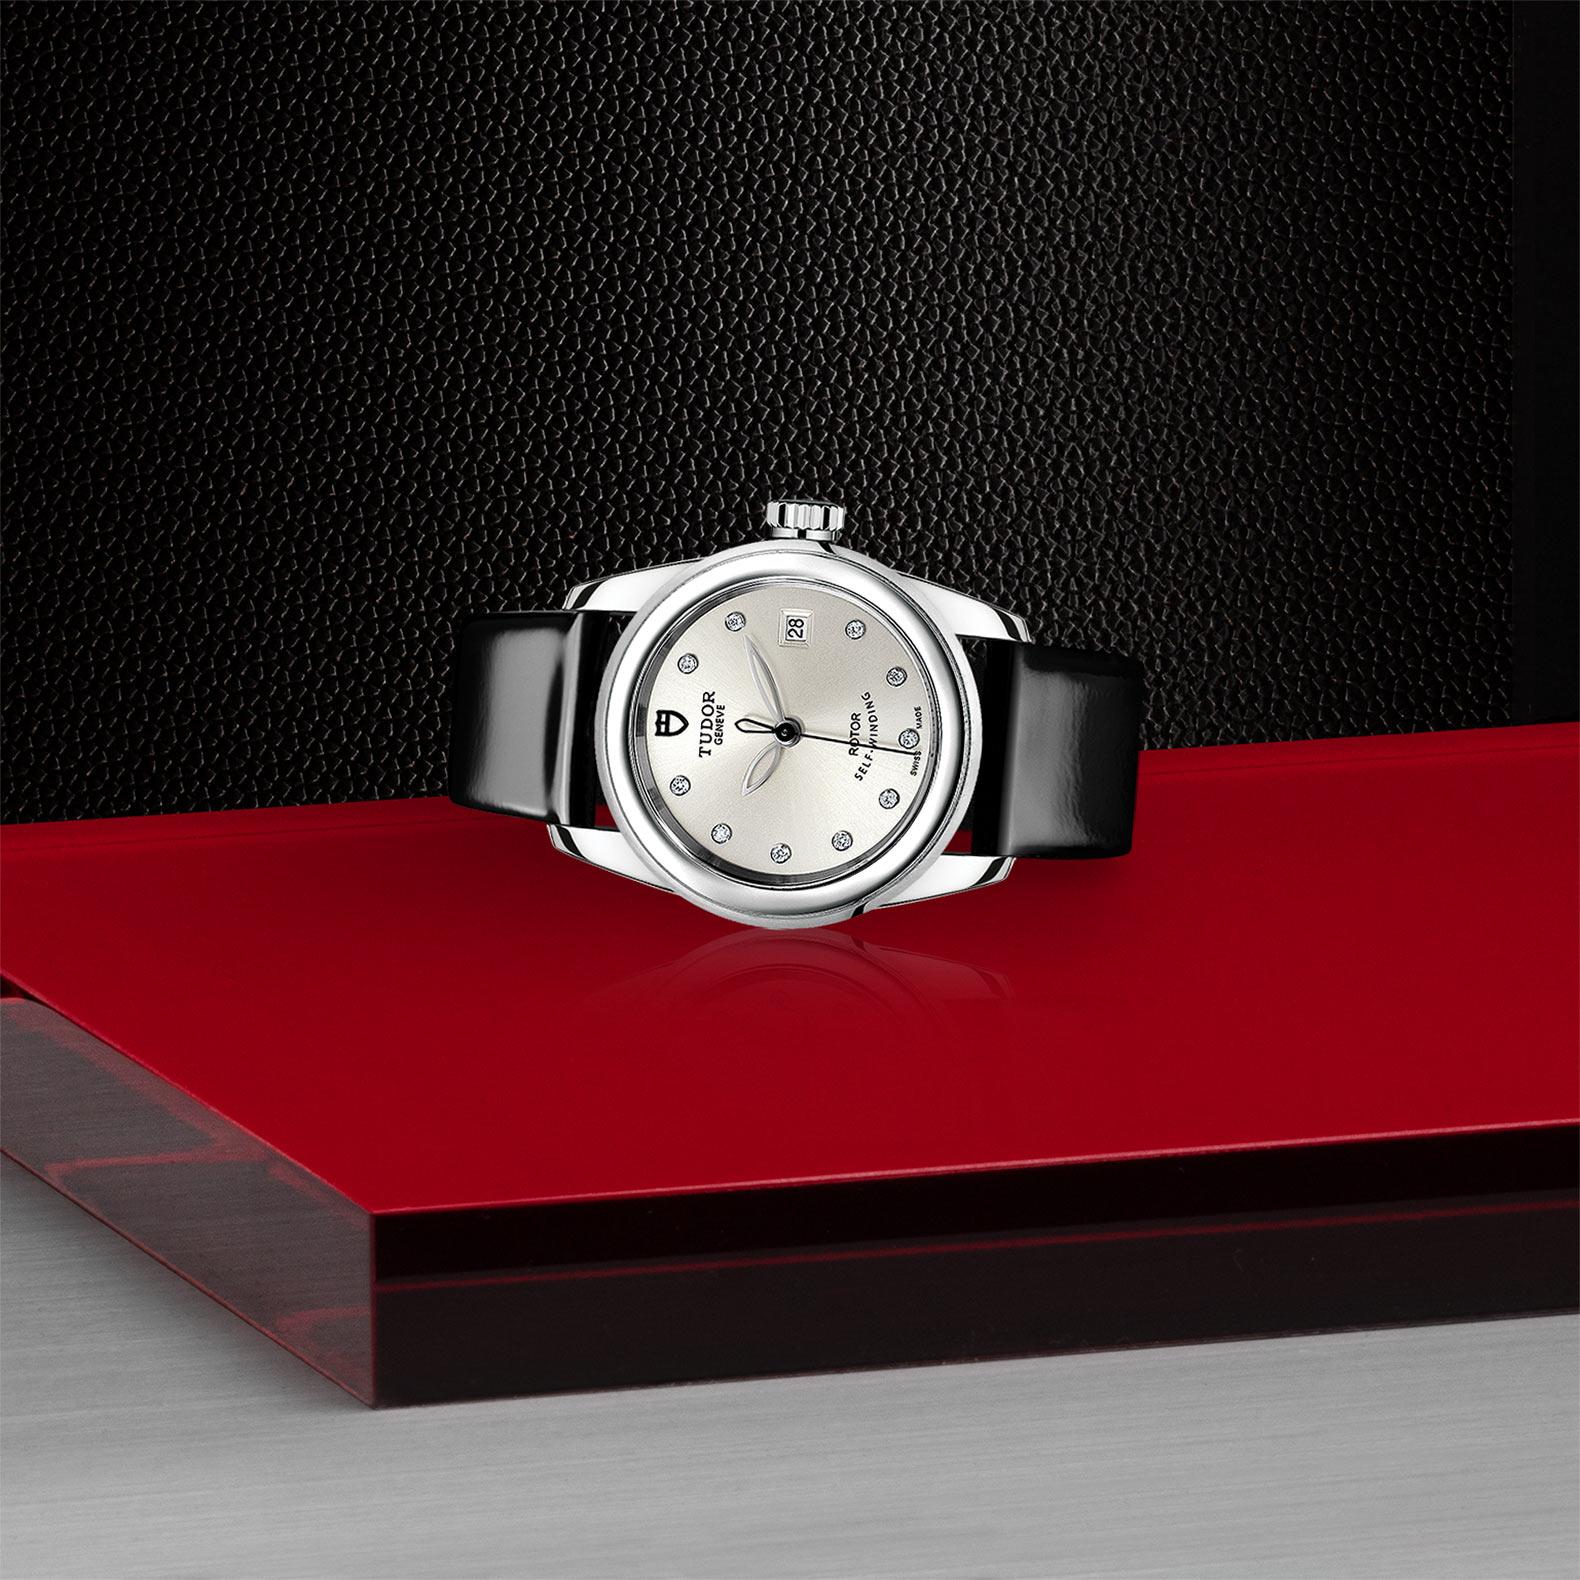 TUDOR Glamour Date M51000 0019 Layingdown